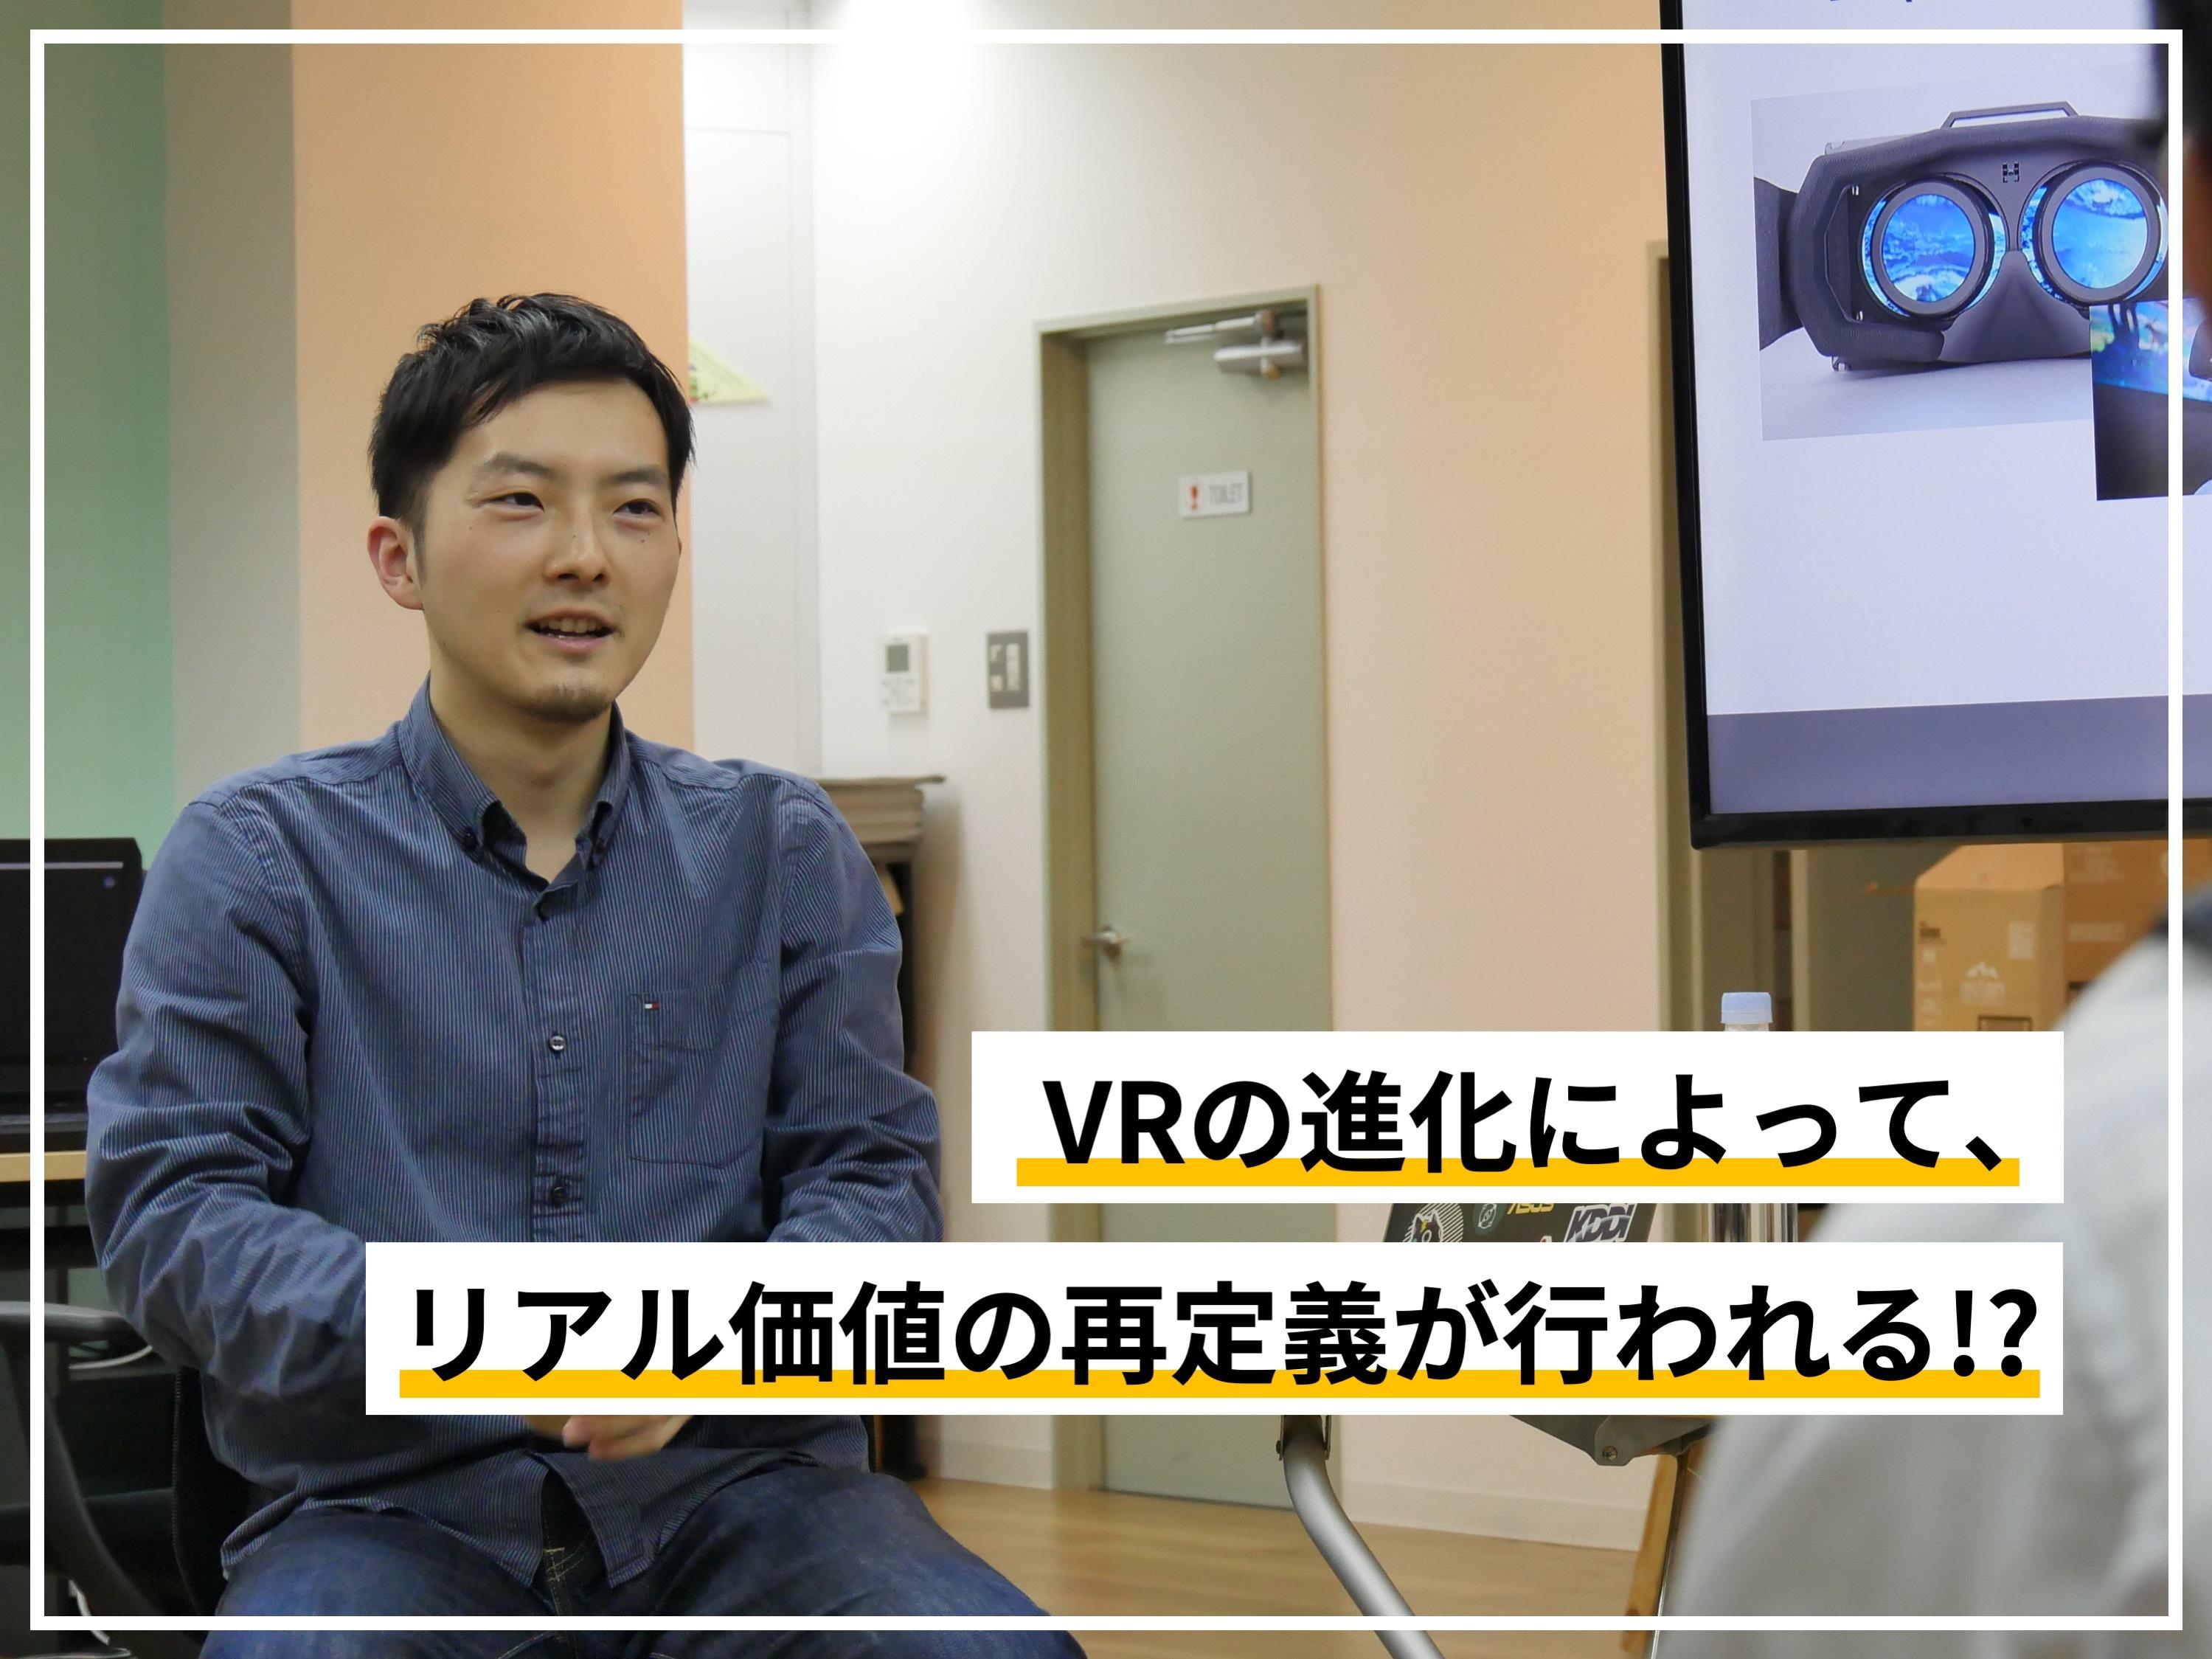 VRの進化によって、リアル価値の再定義が行われる!?